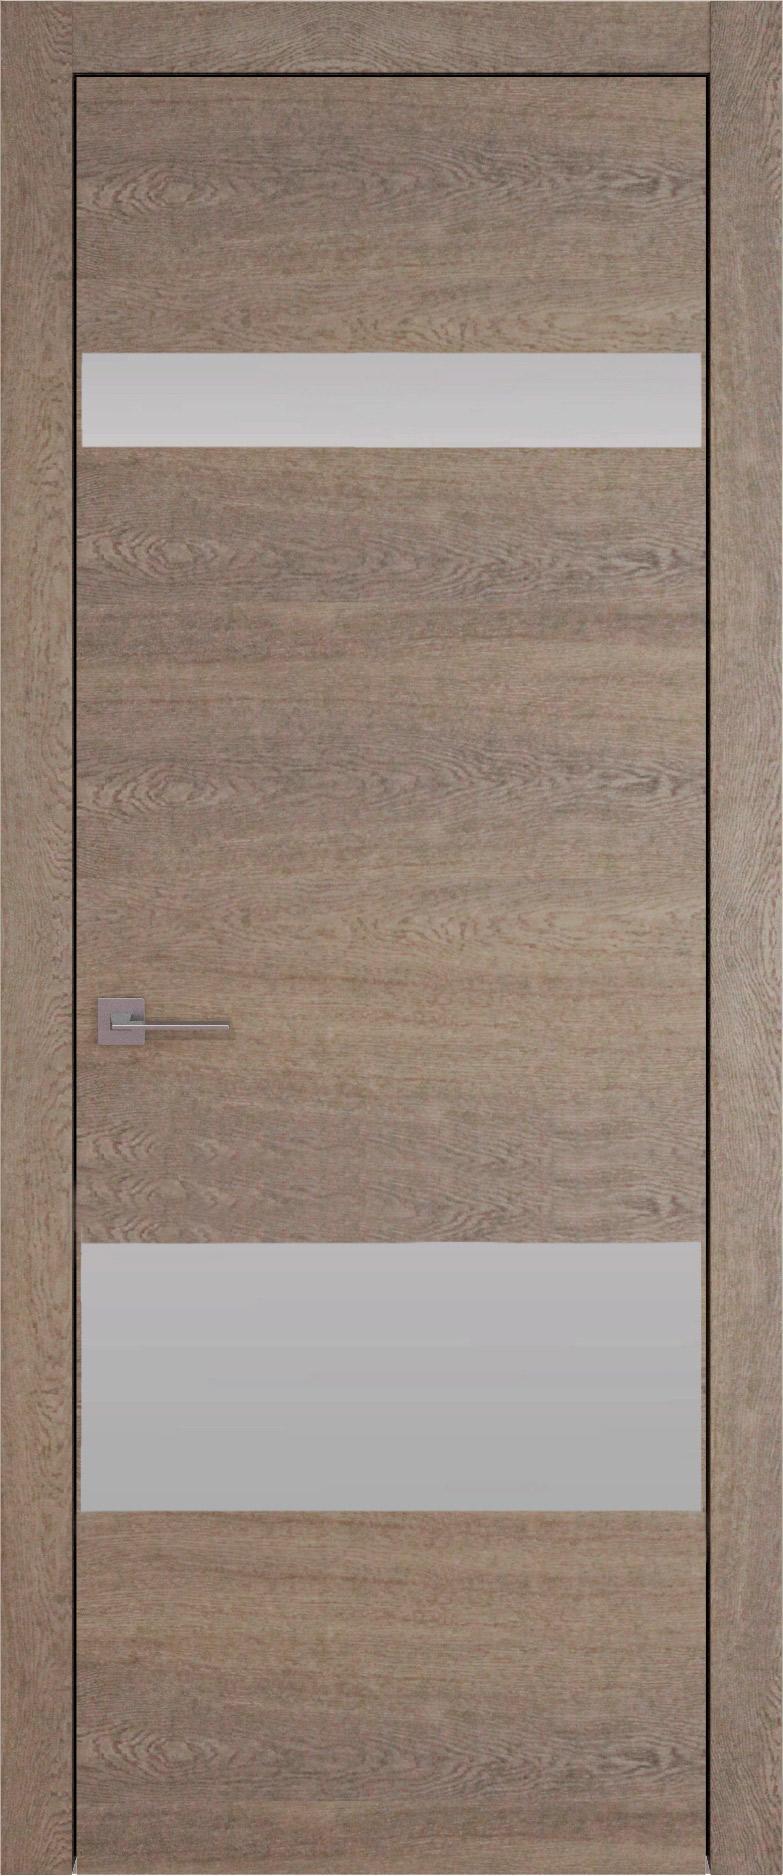 Tivoli К-4 цвет - Дуб антик Без стекла (ДГ)